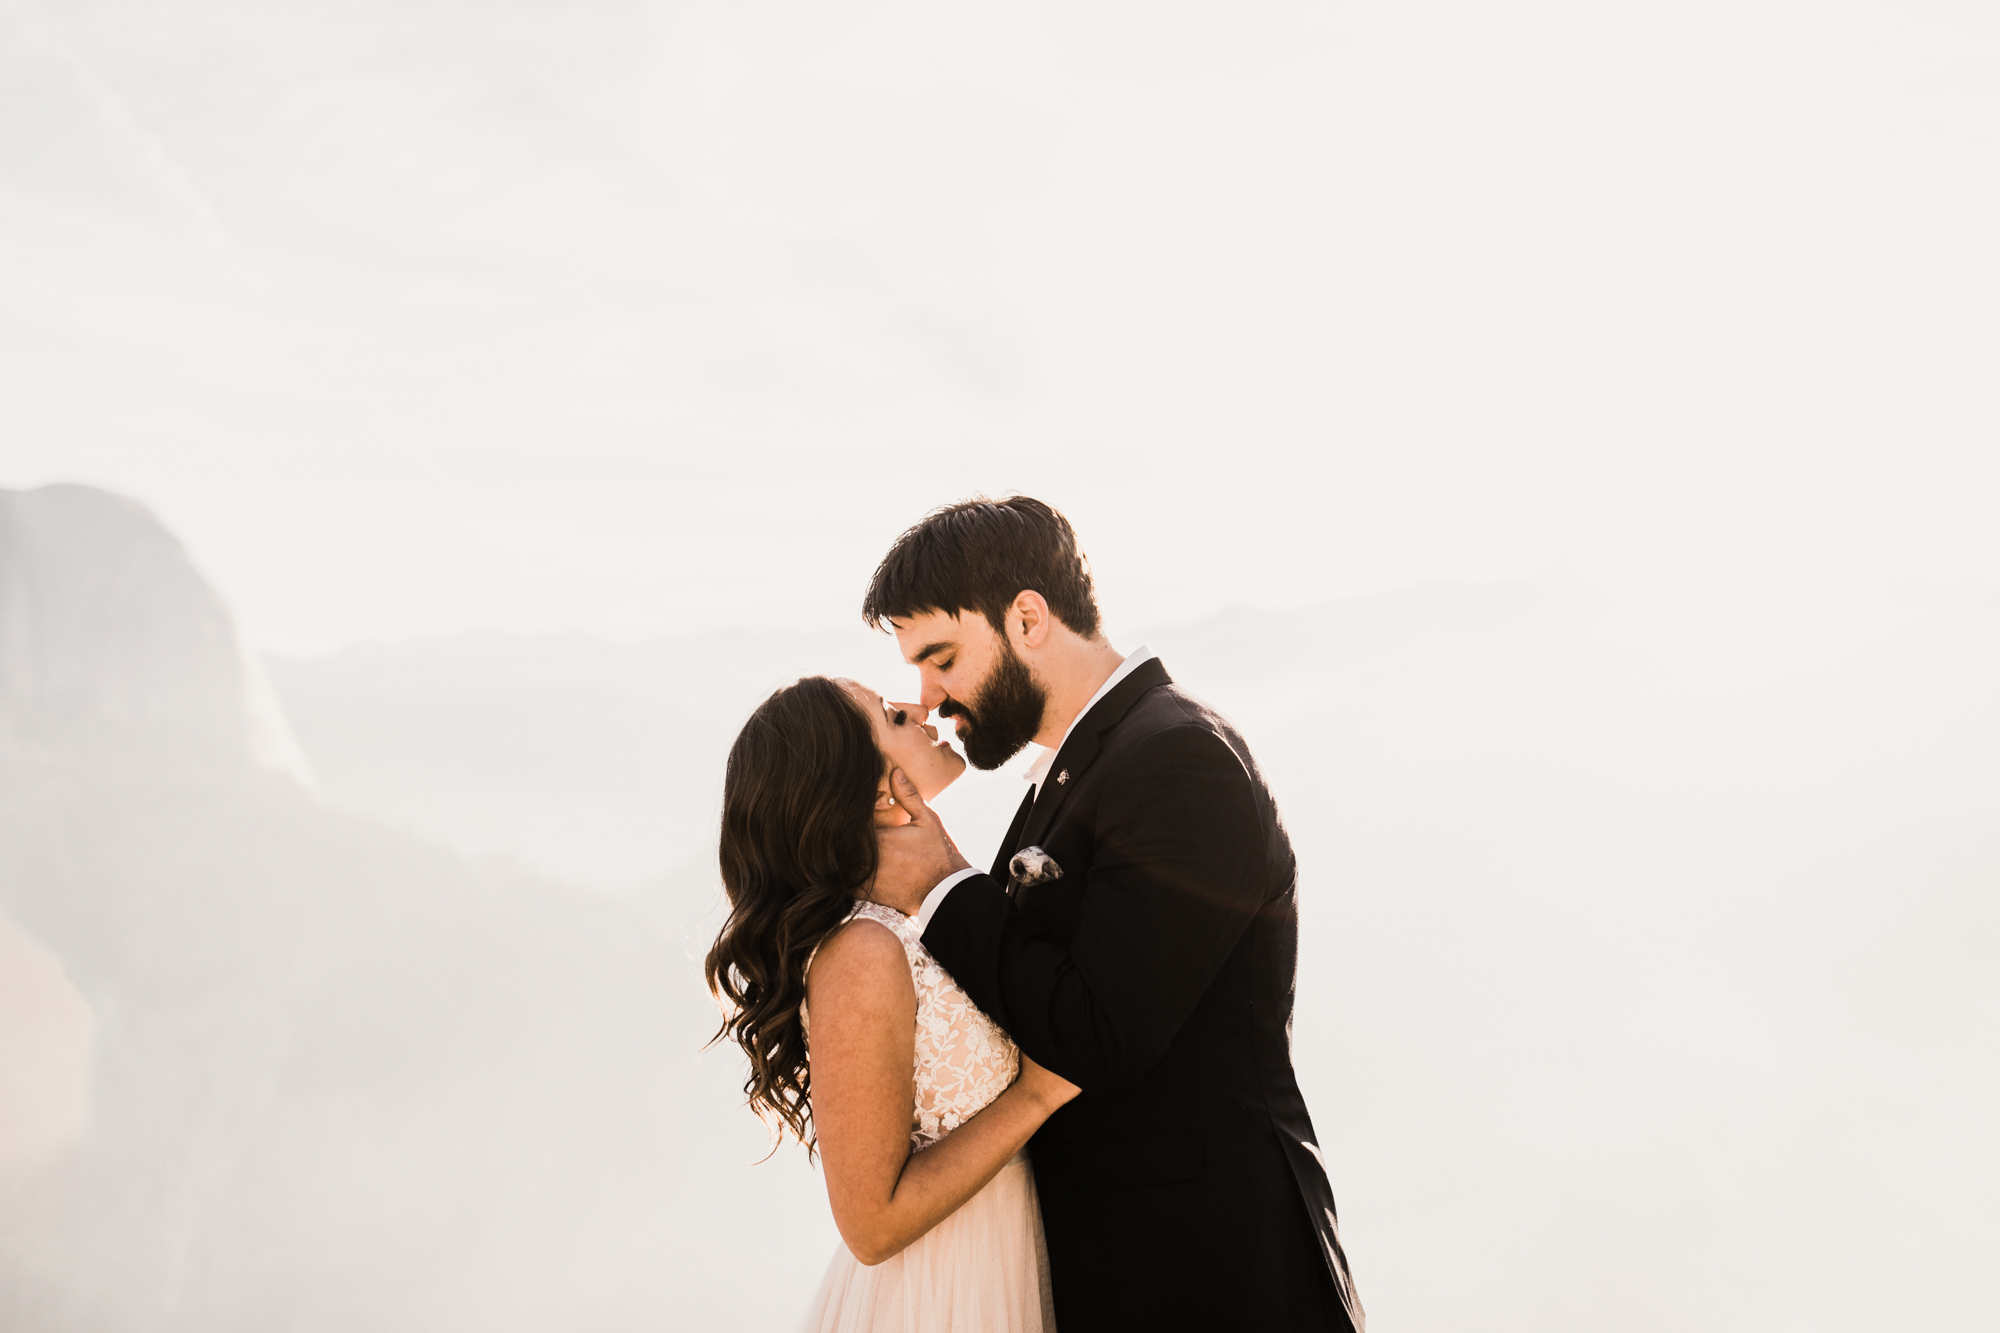 intimate elopement in yosemite national park | destination adventure wedding photographers | the hearnes adventure photography | www.thehearnes.com